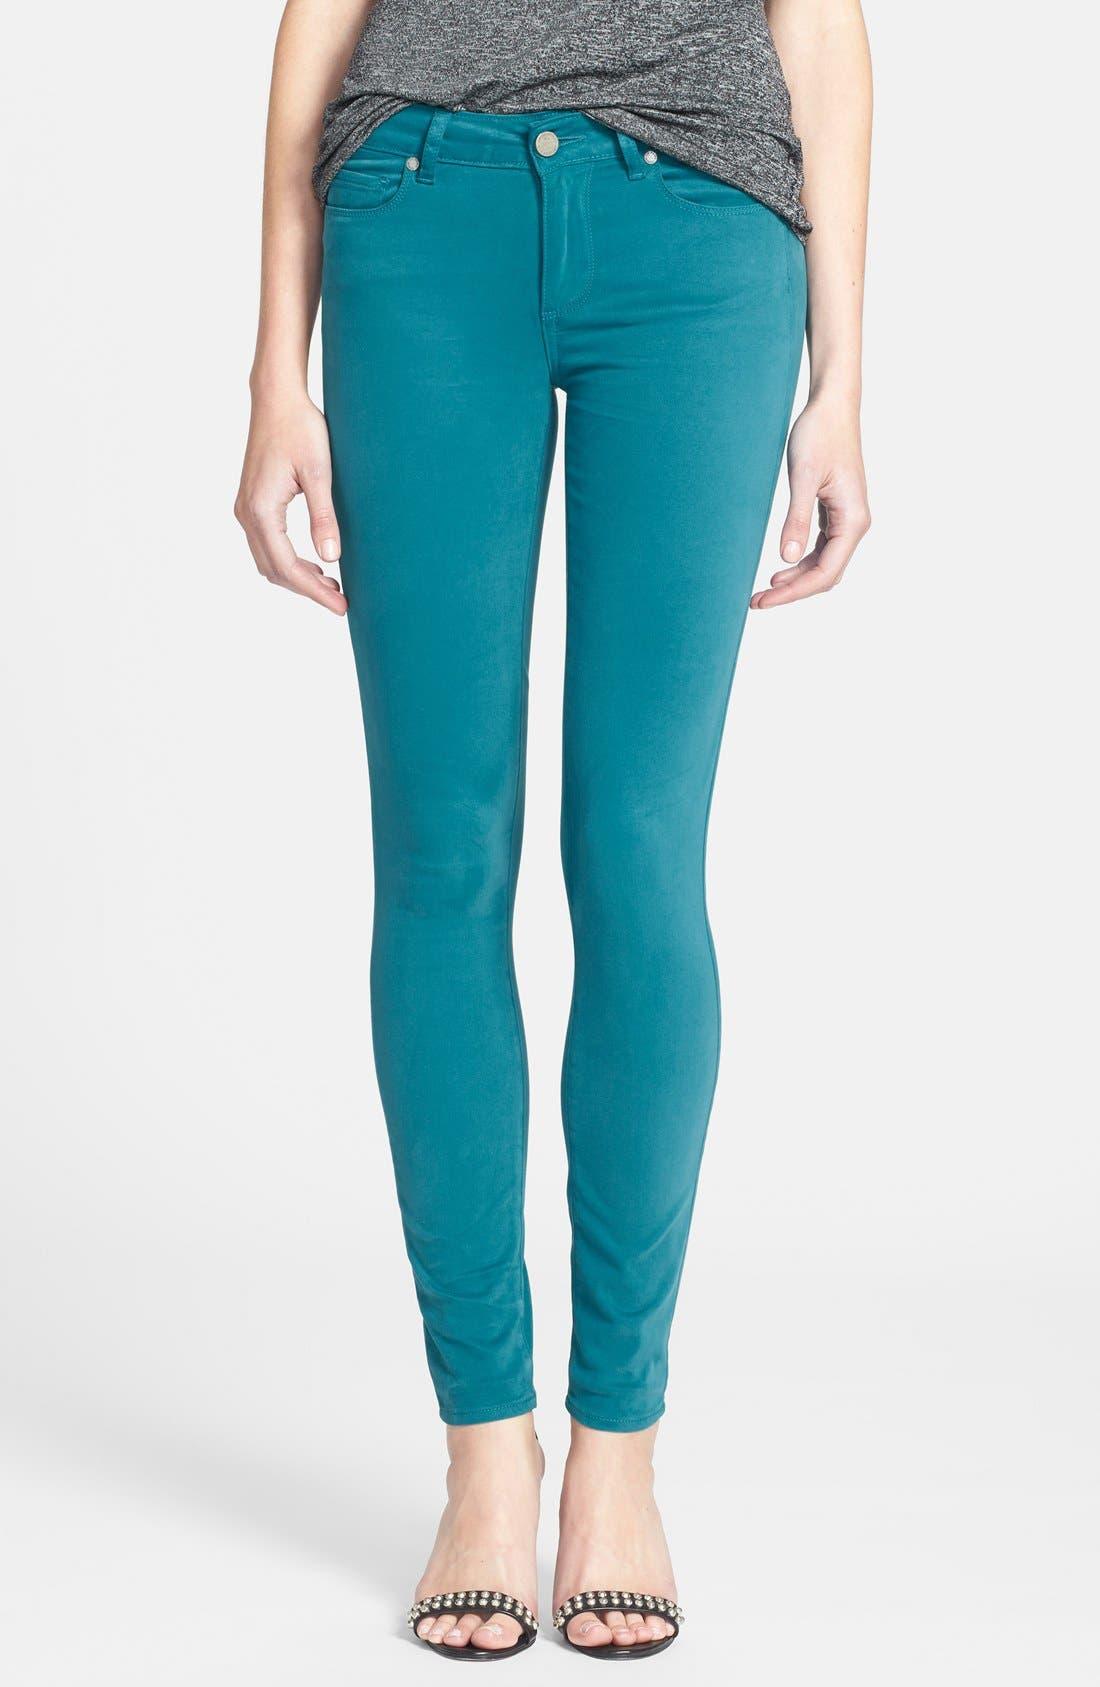 Main Image - Paige Denim 'Verdugo' Ultra Skinny Jeans (Deep Turquoise)